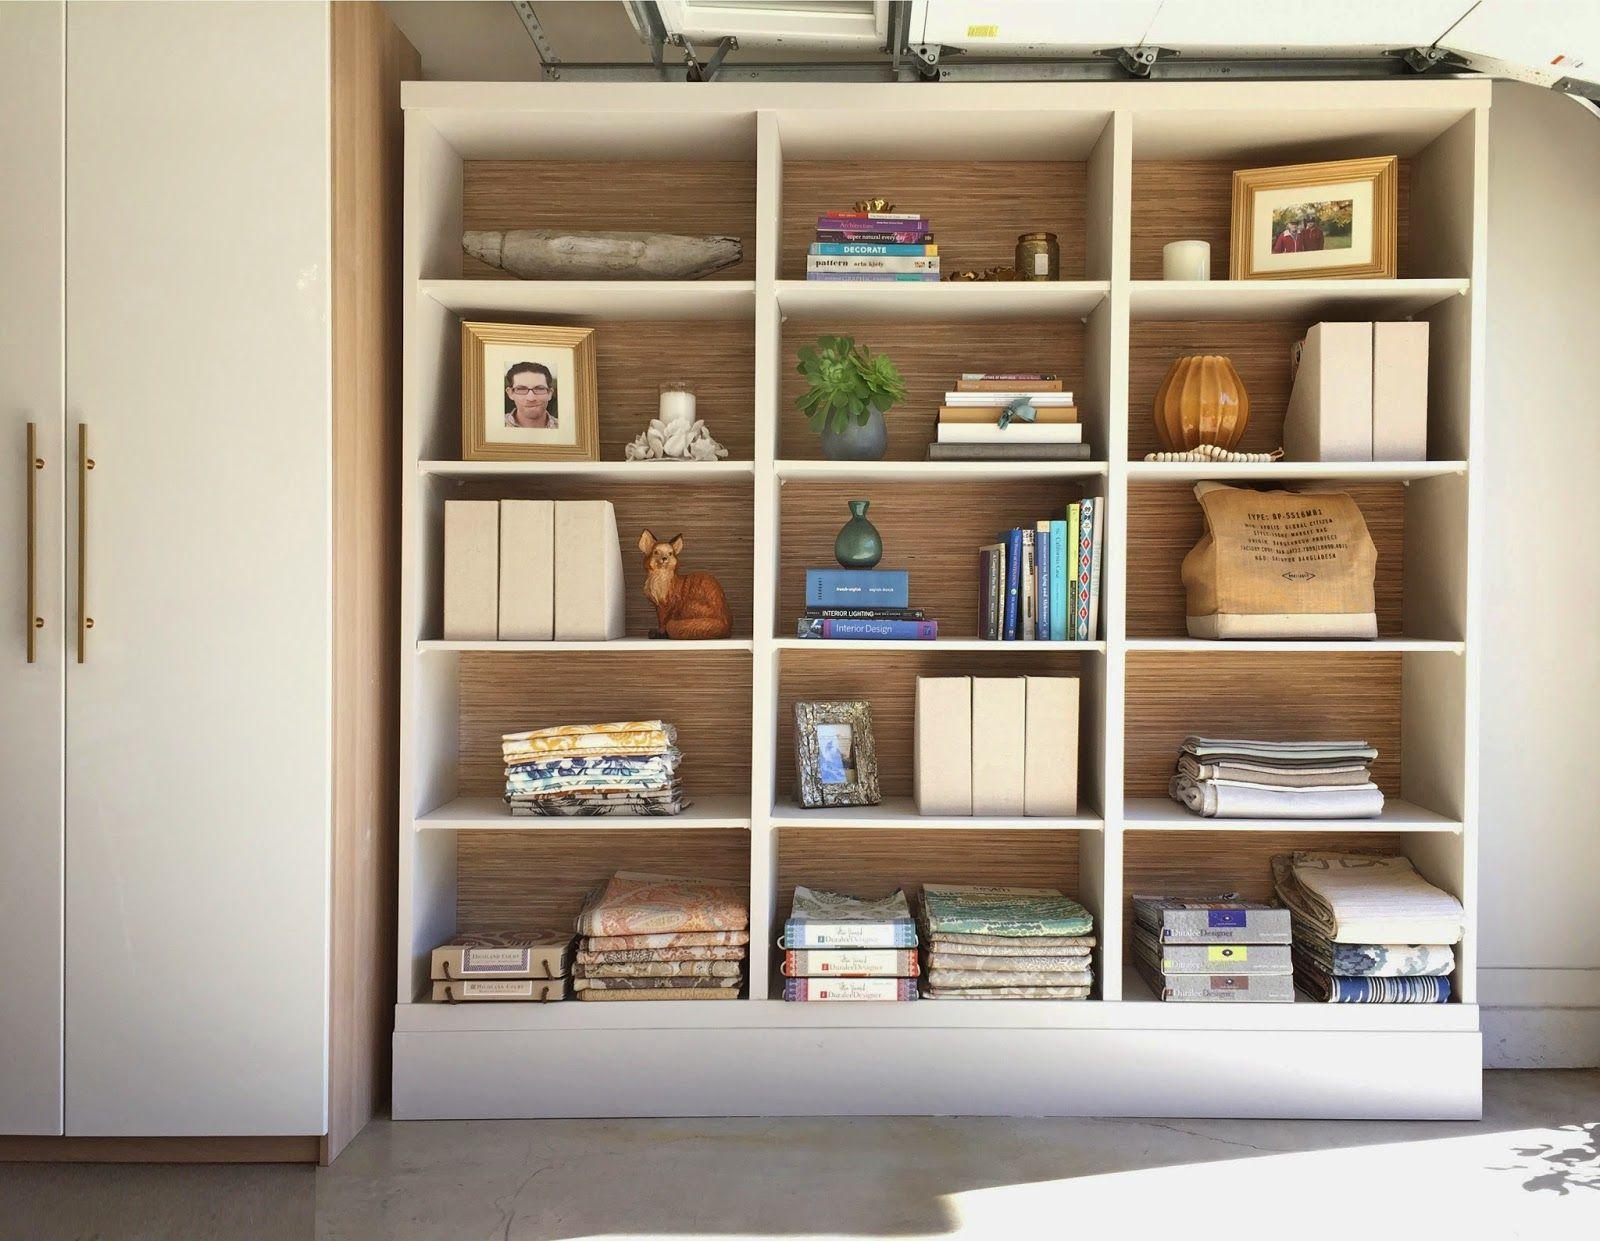 Ikea Hack Bookcase: #TrovareDesign: #DIY IKEA PAX Bookcase Hack